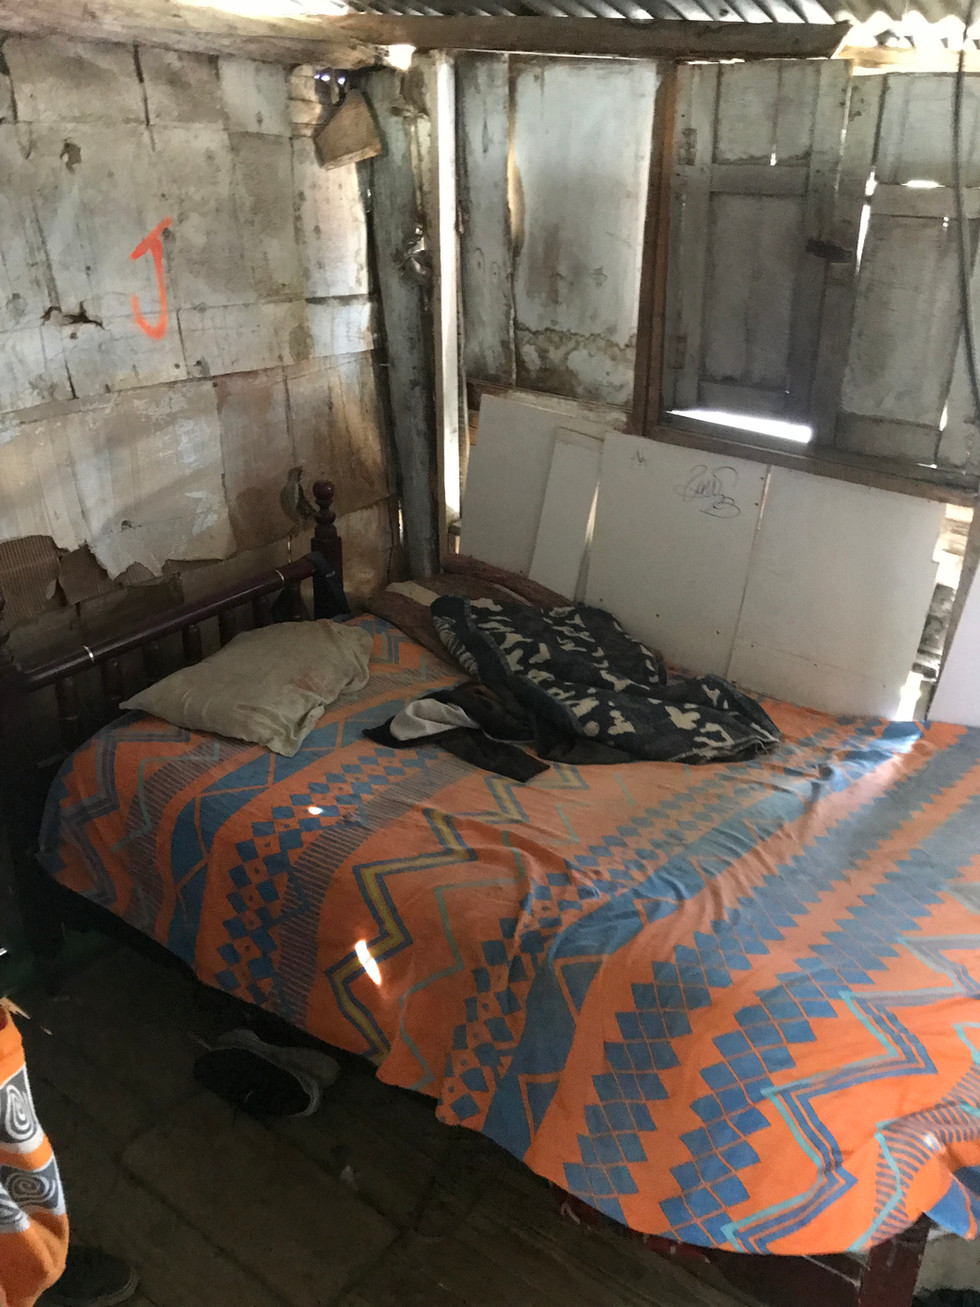 Bedroom living in the Barrio